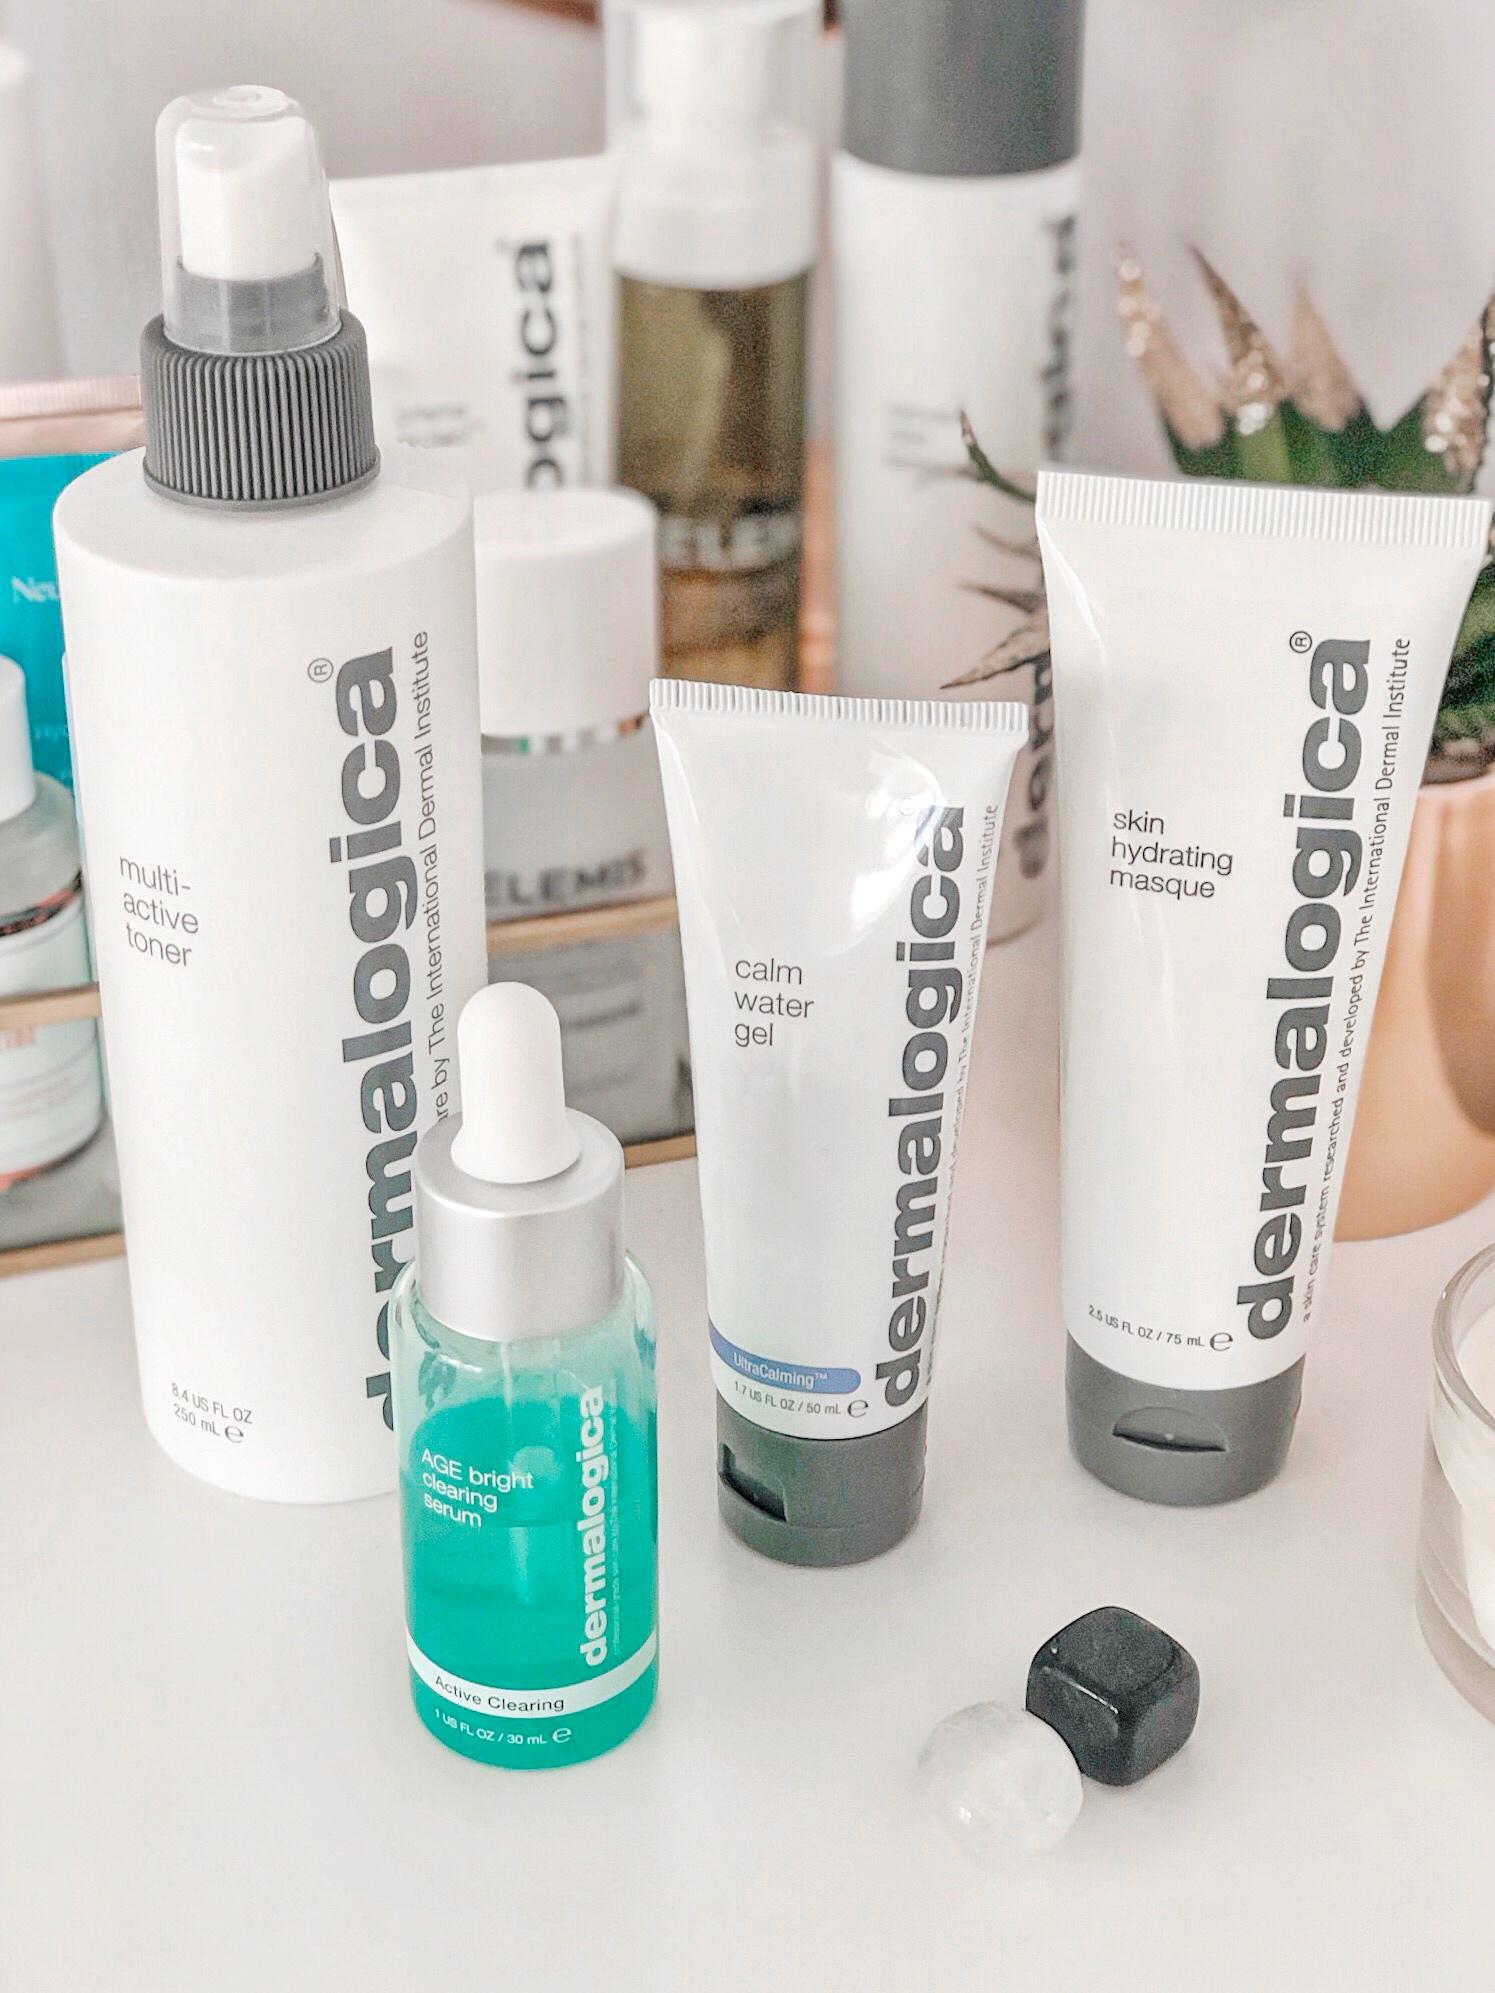 Skinfluencer Dermalogica Review